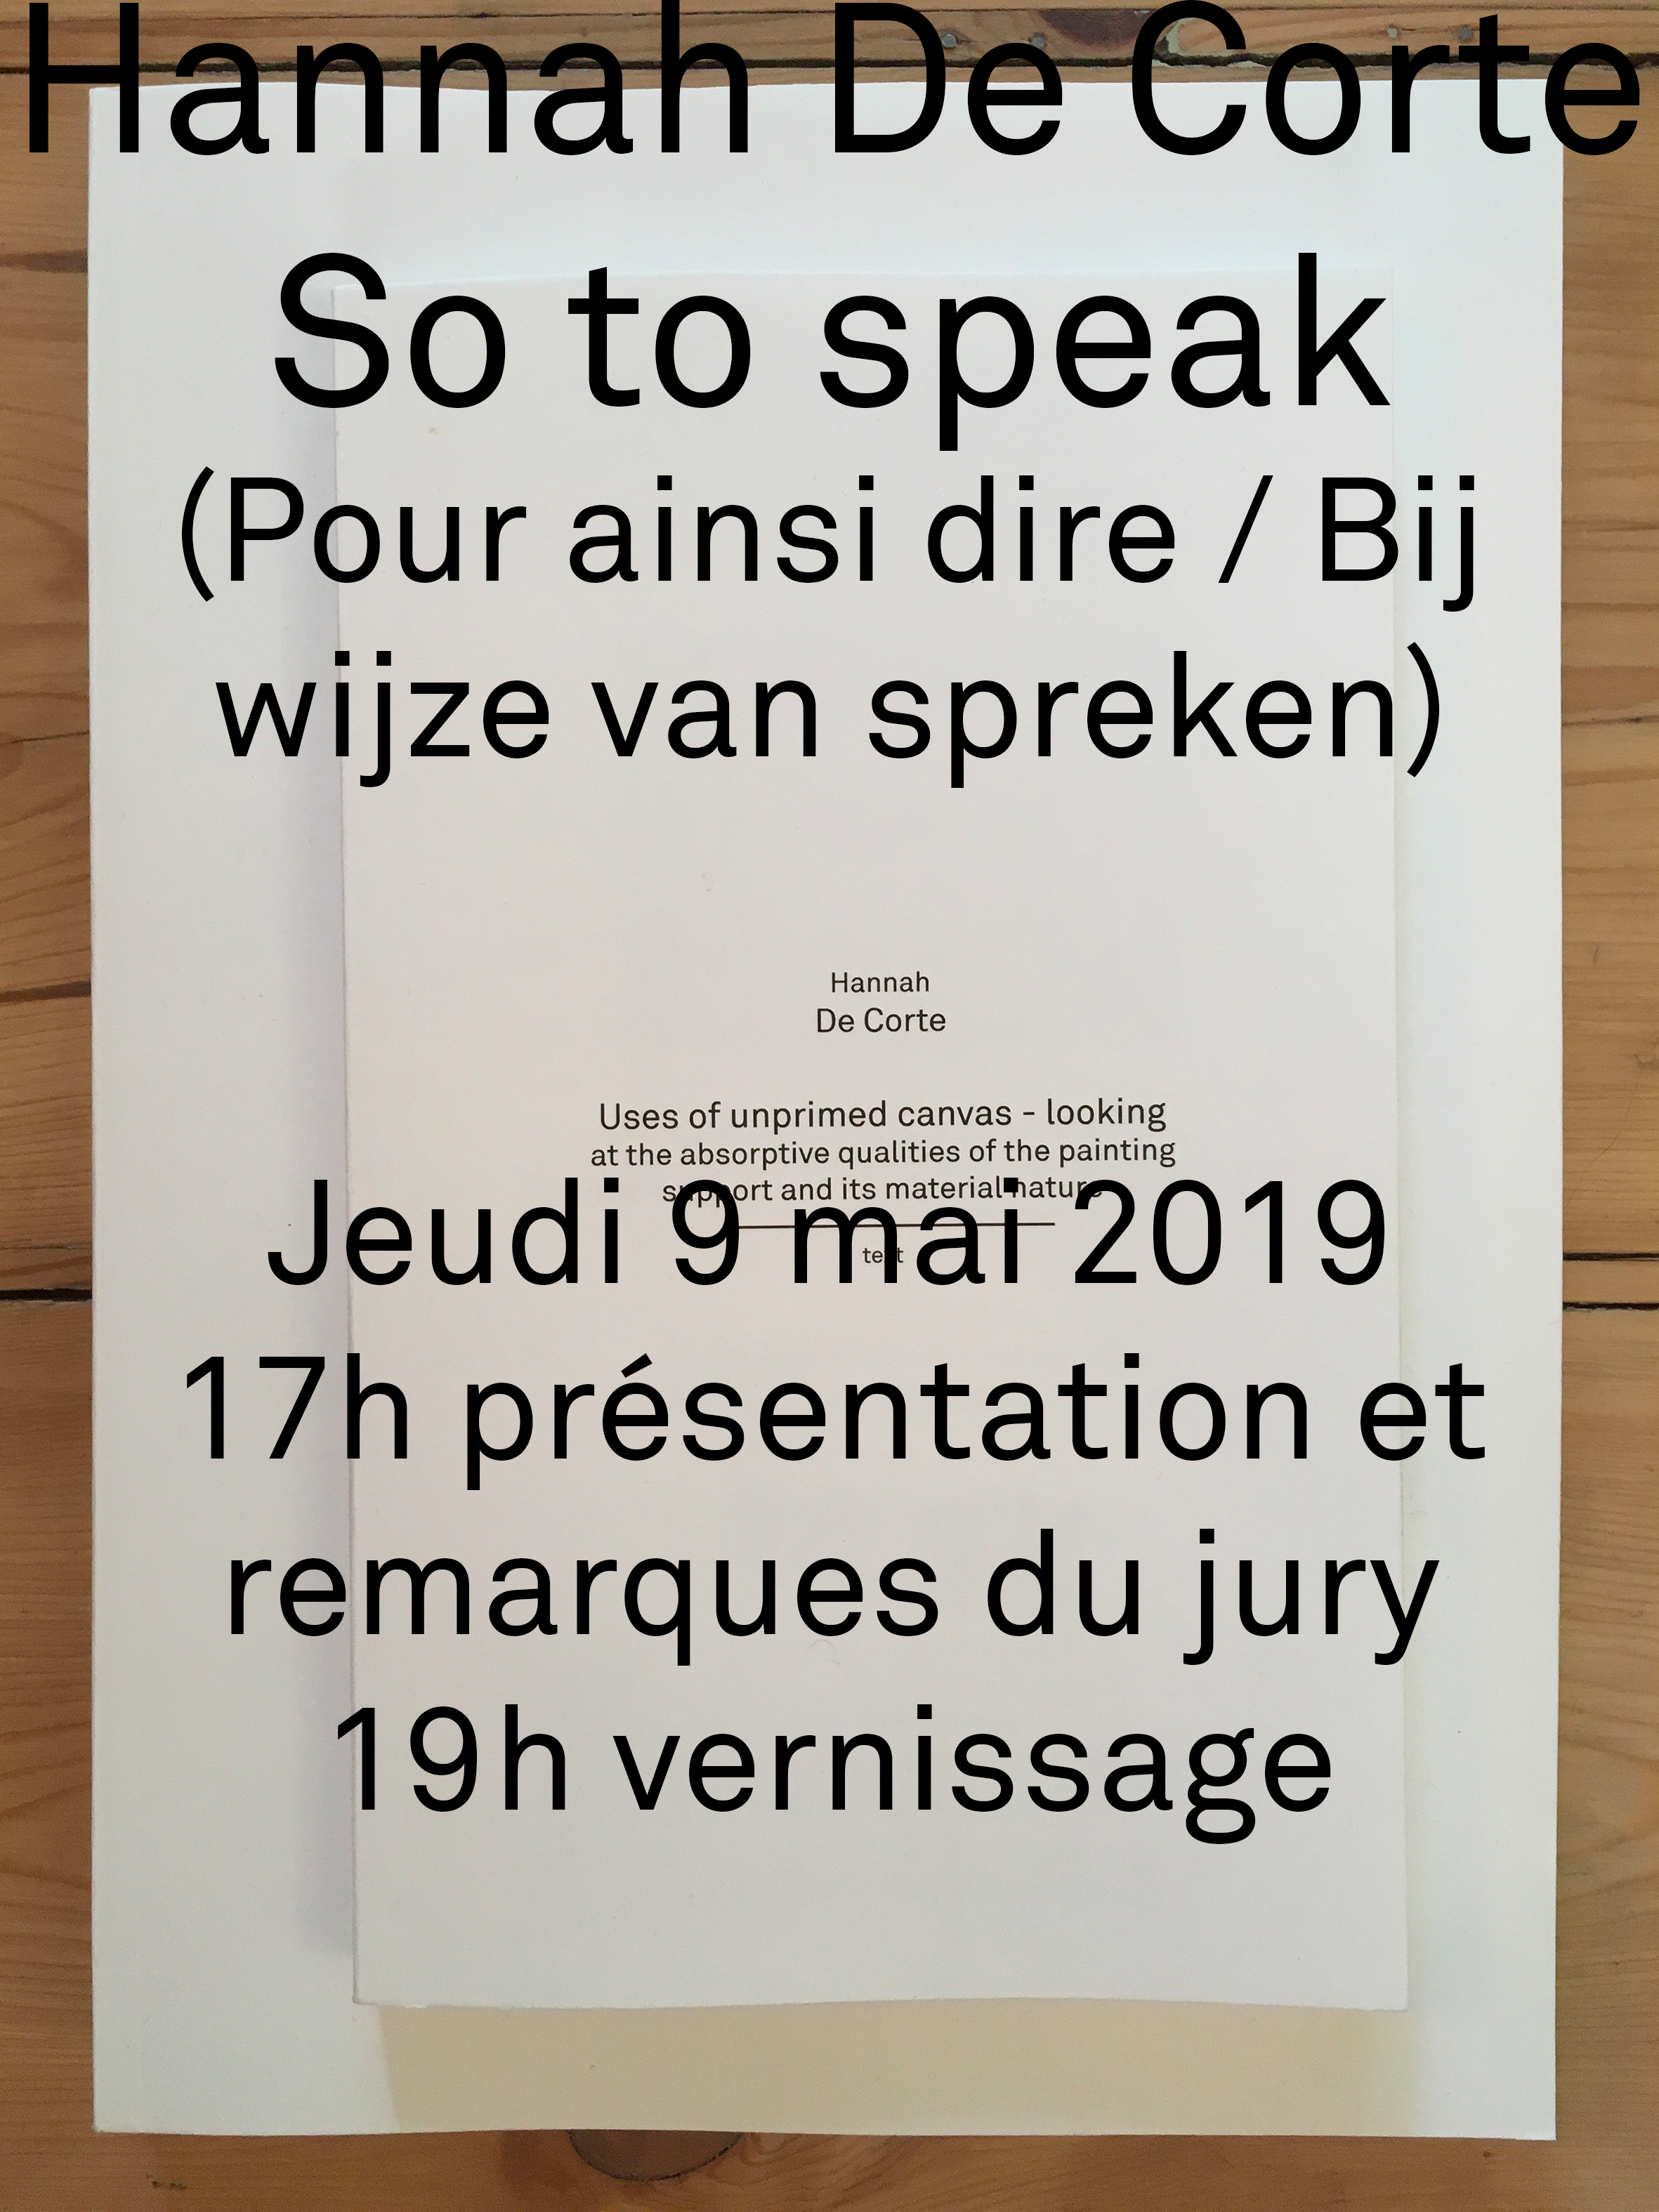 So to speak carton invitation thèse.jpg